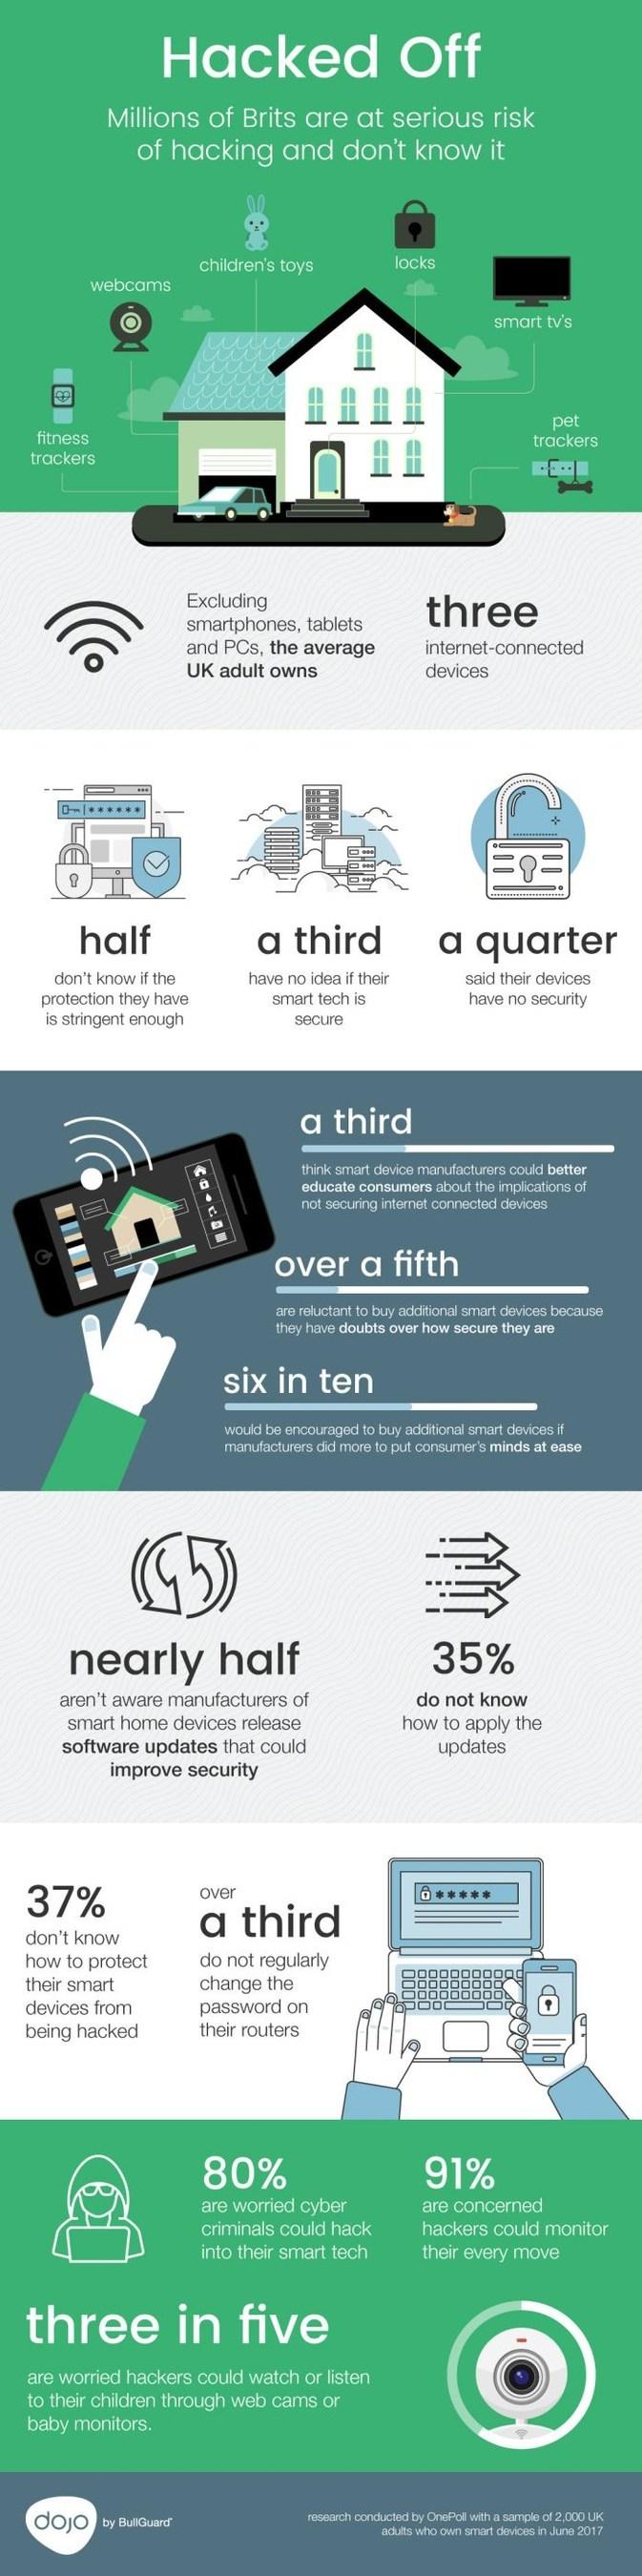 Hacked Off Infographic (PRNewsfoto/BullGuard)